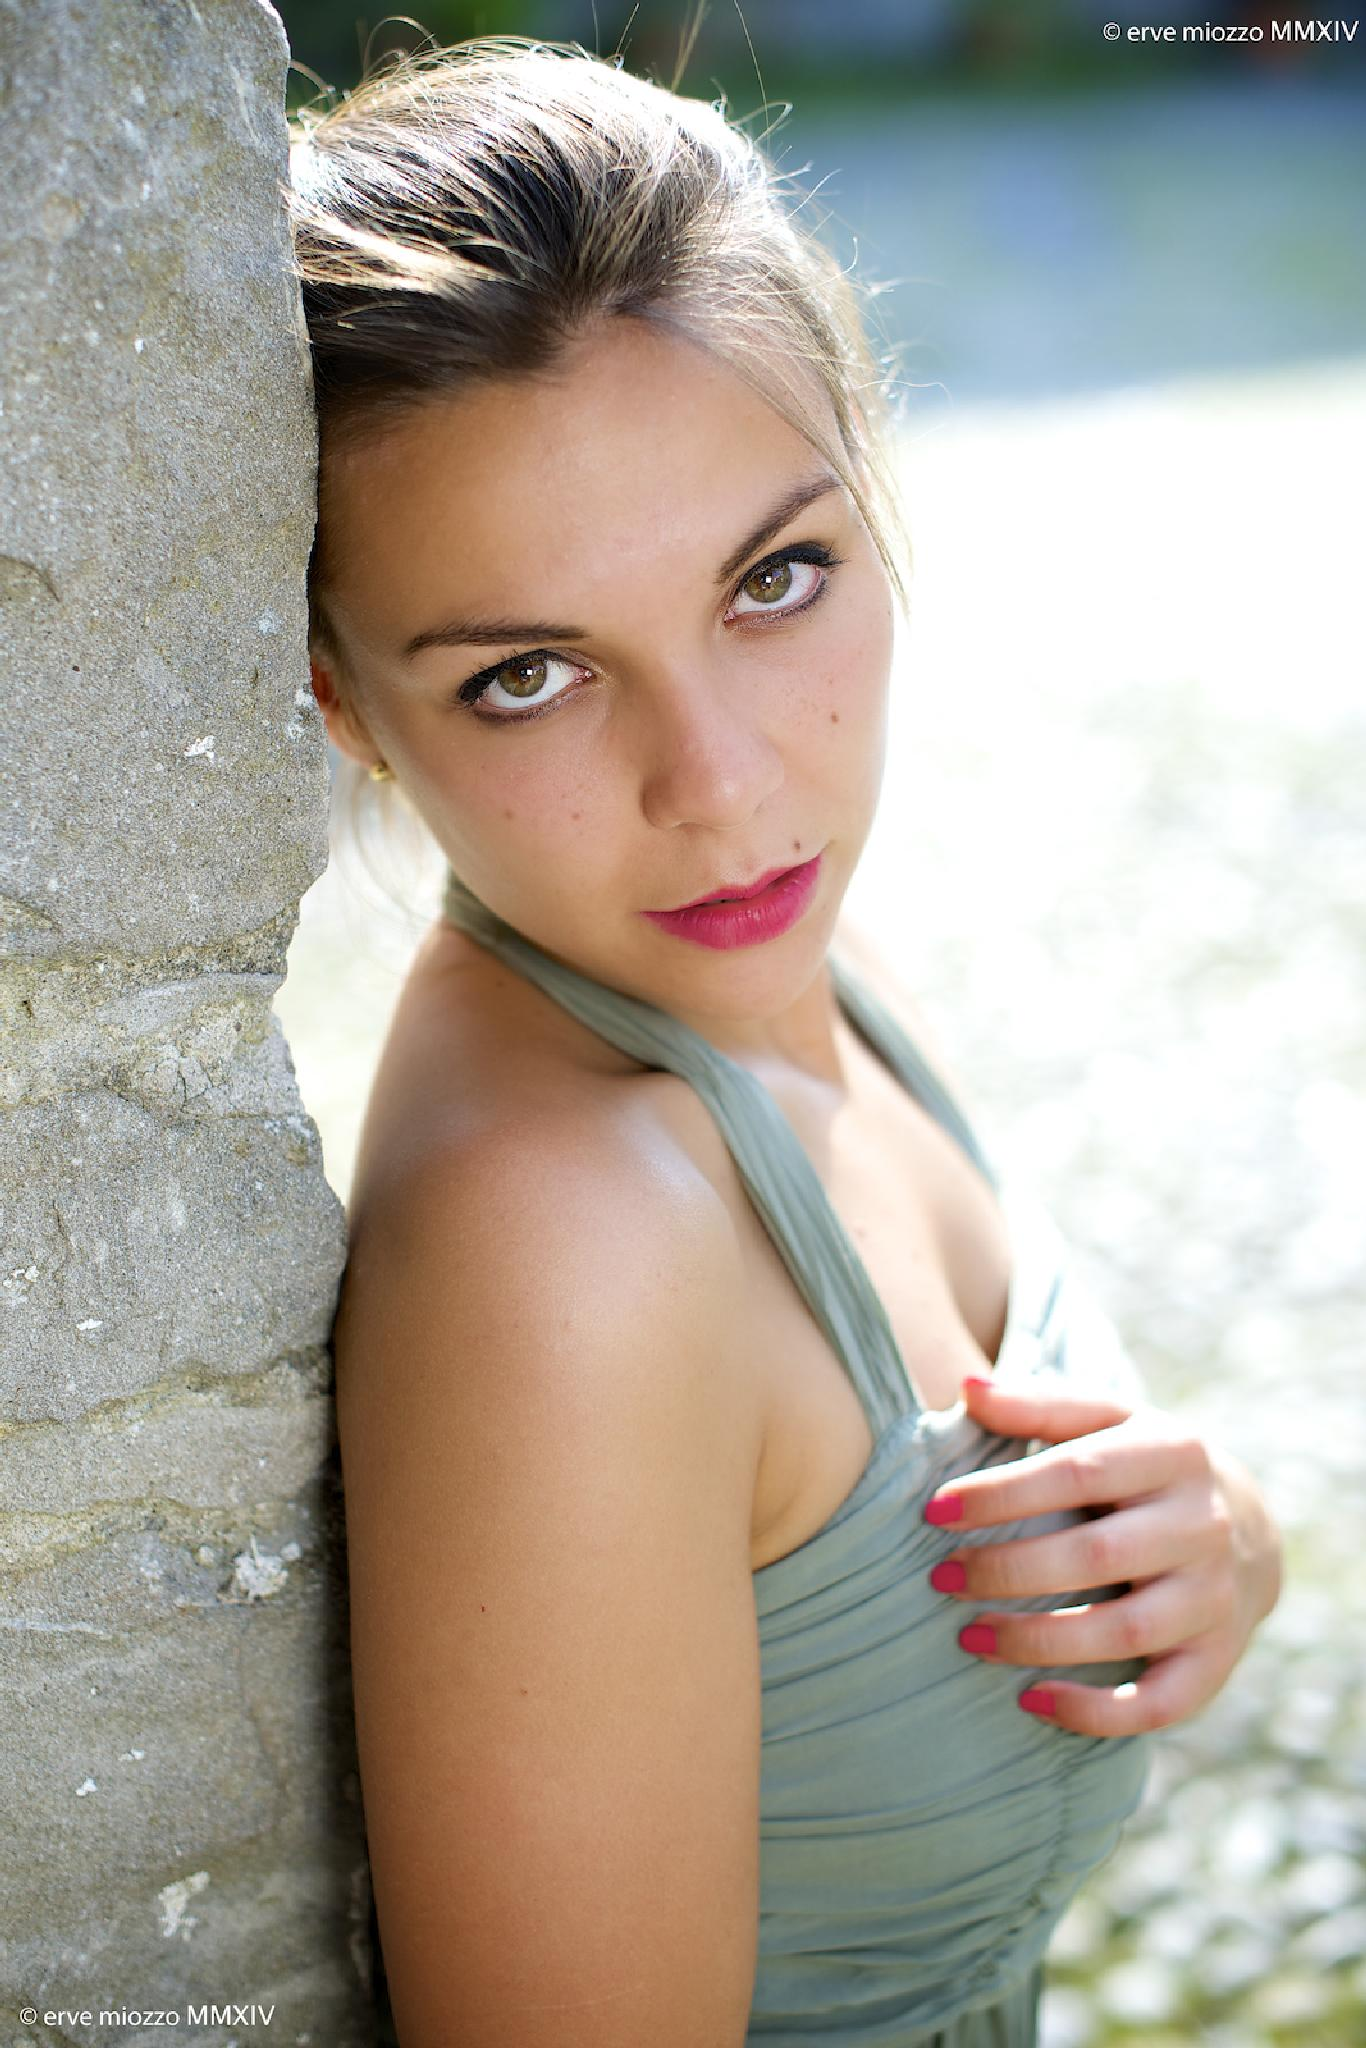 Arianna by Erve Miozzo